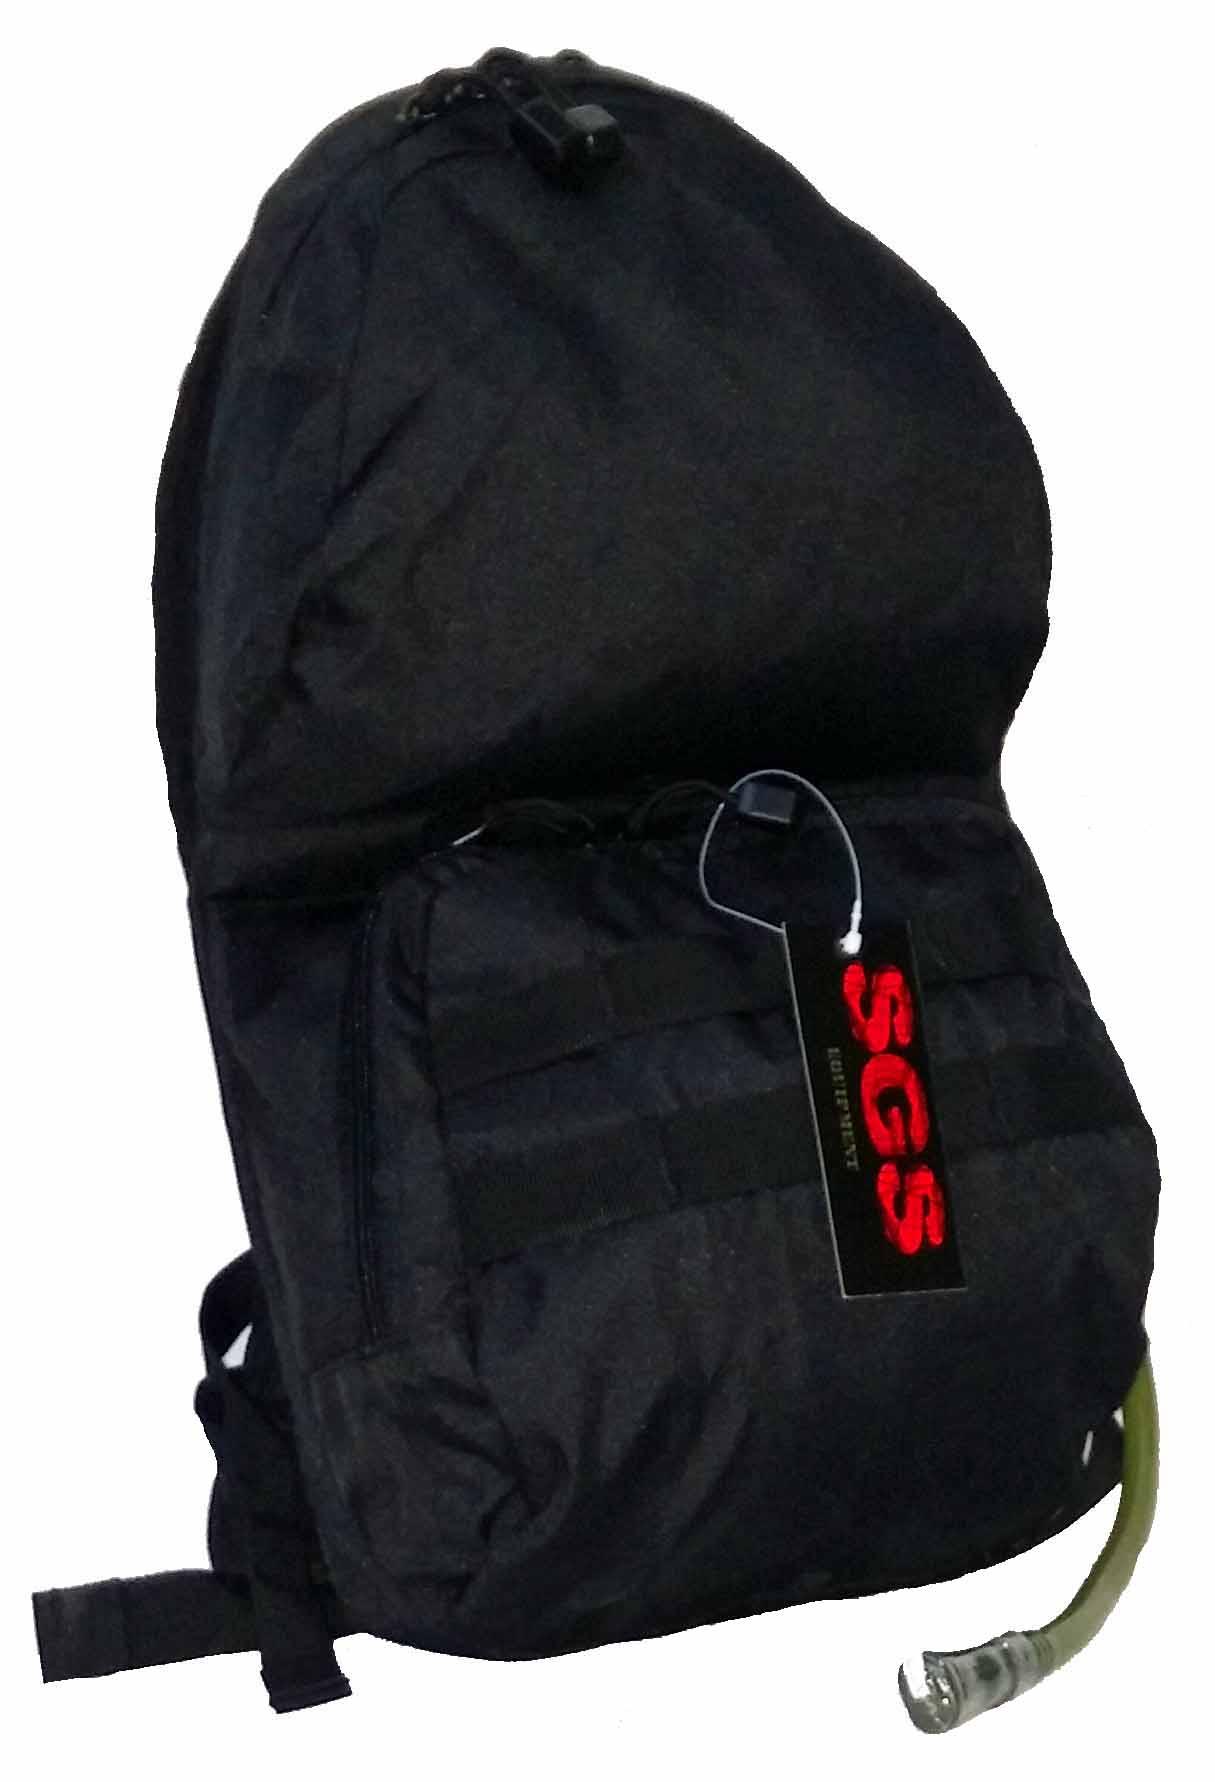 SGS Black hydratation pack